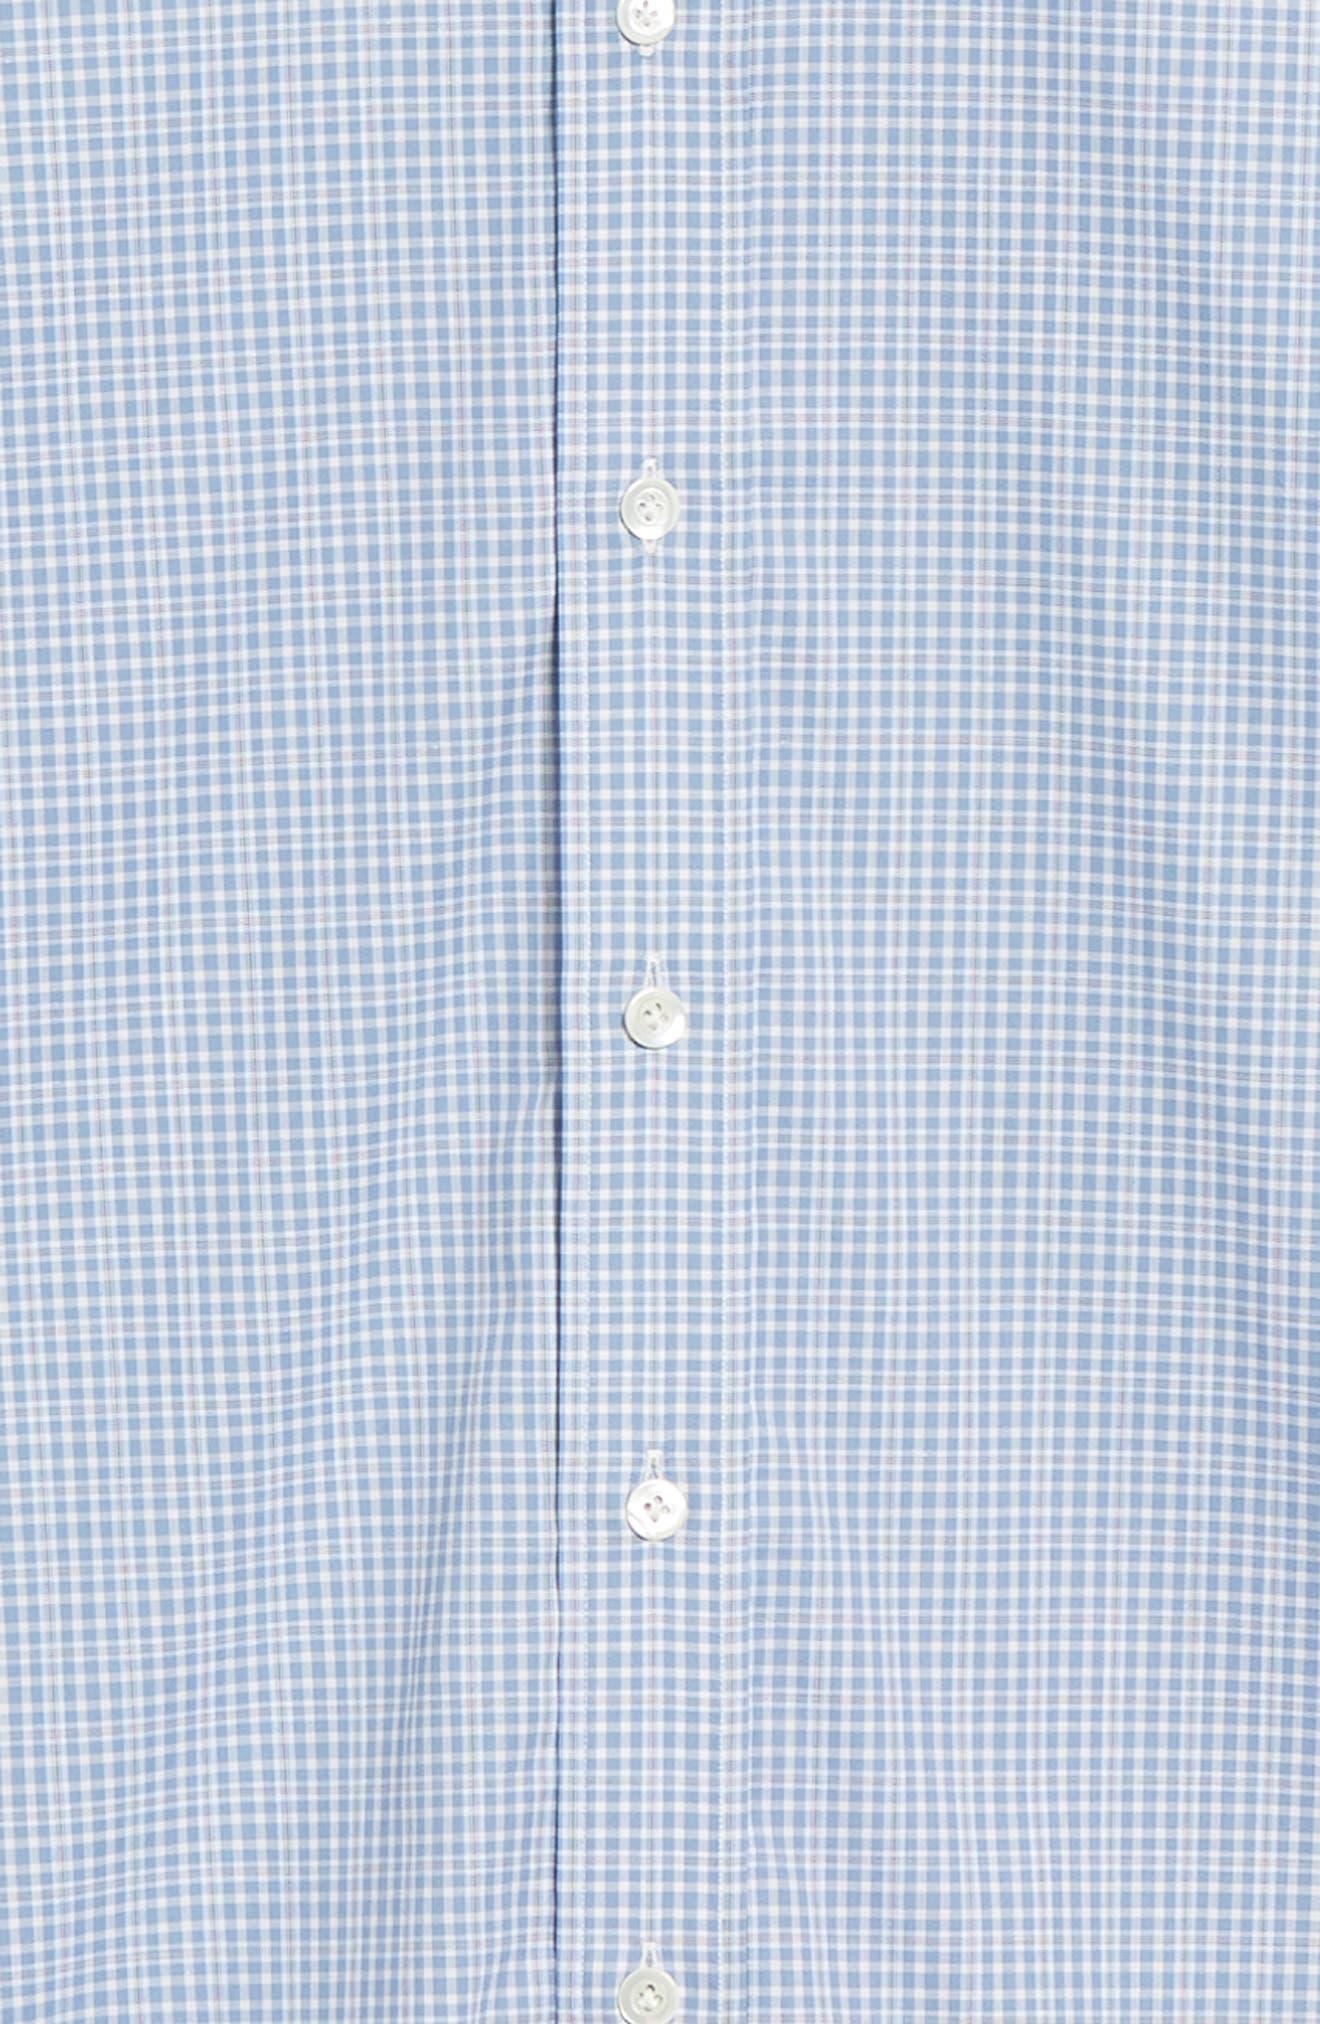 Slim Fit Check Dress Shirt,                             Alternate thumbnail 6, color,                             BLUE